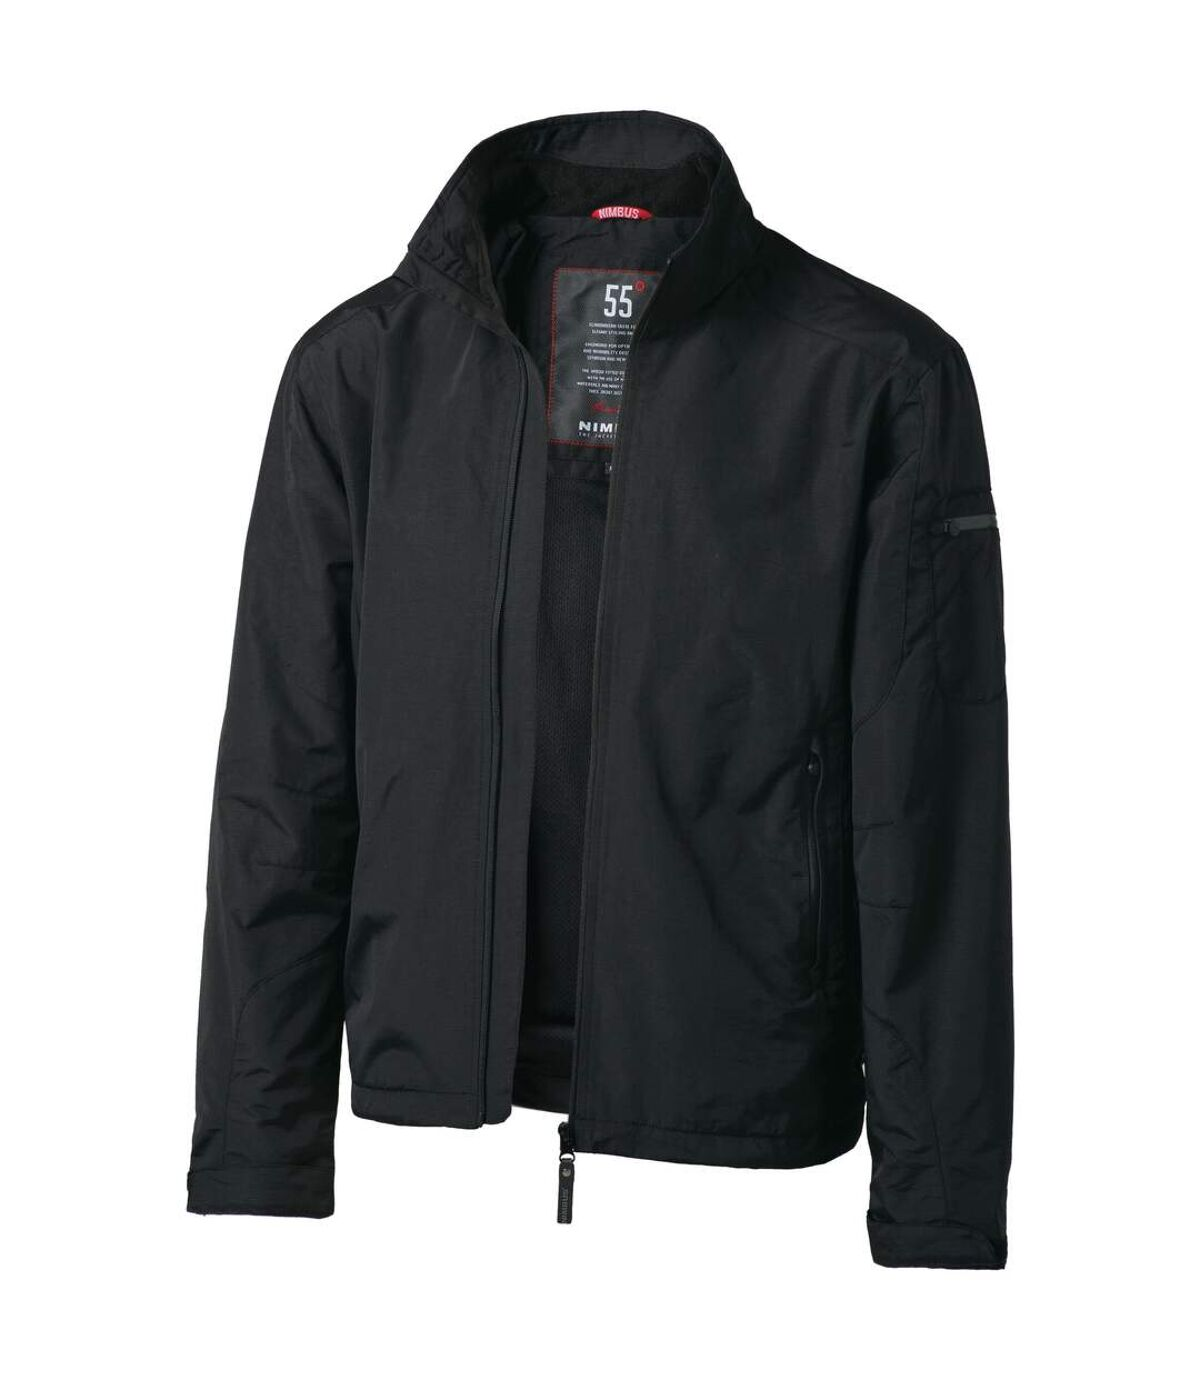 Nimbus Mens Providence Windproof Waterproof Jacket (Black) - UTRW918